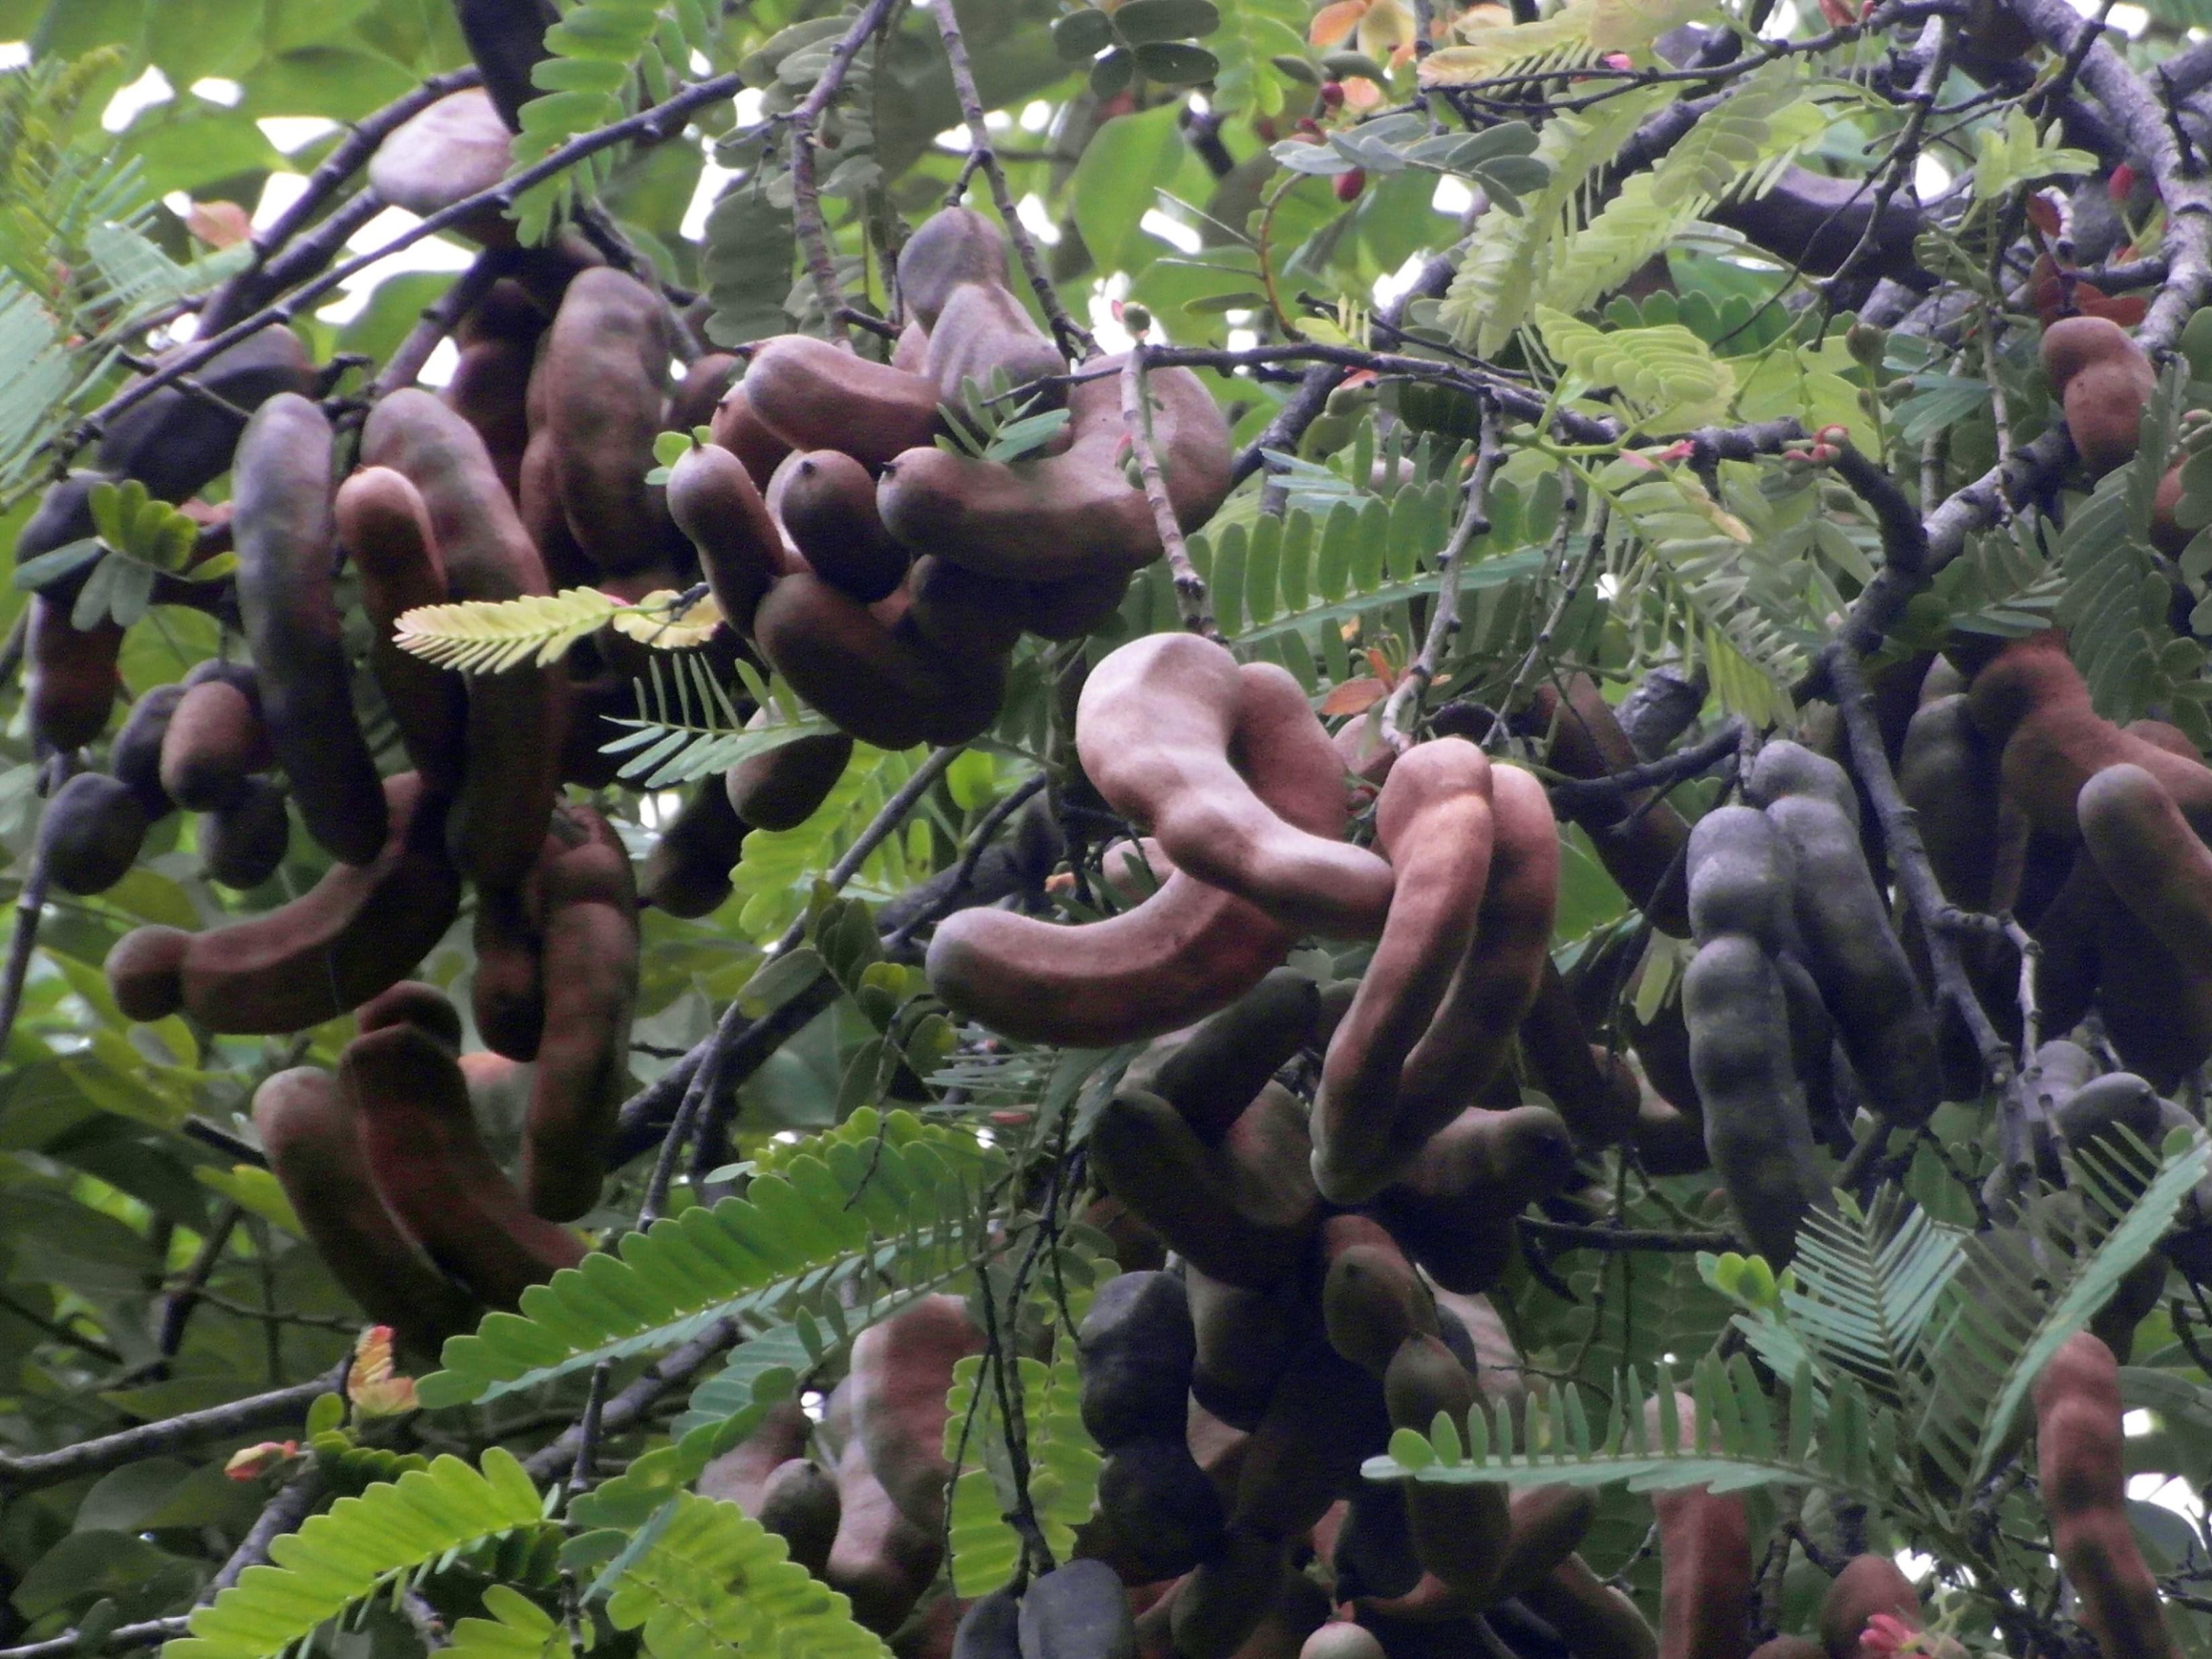 Tamarind Fruit Tree, Seed, Seeds, Ripe, Raw, HQ Photo